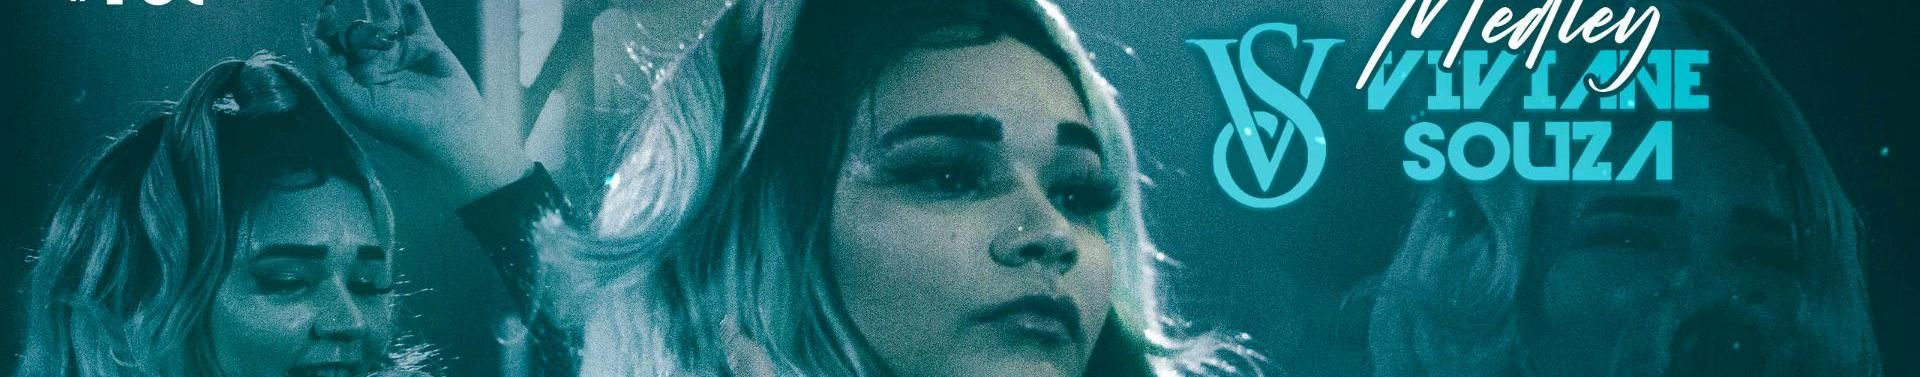 Imagem de capa de Viviane souza oficial